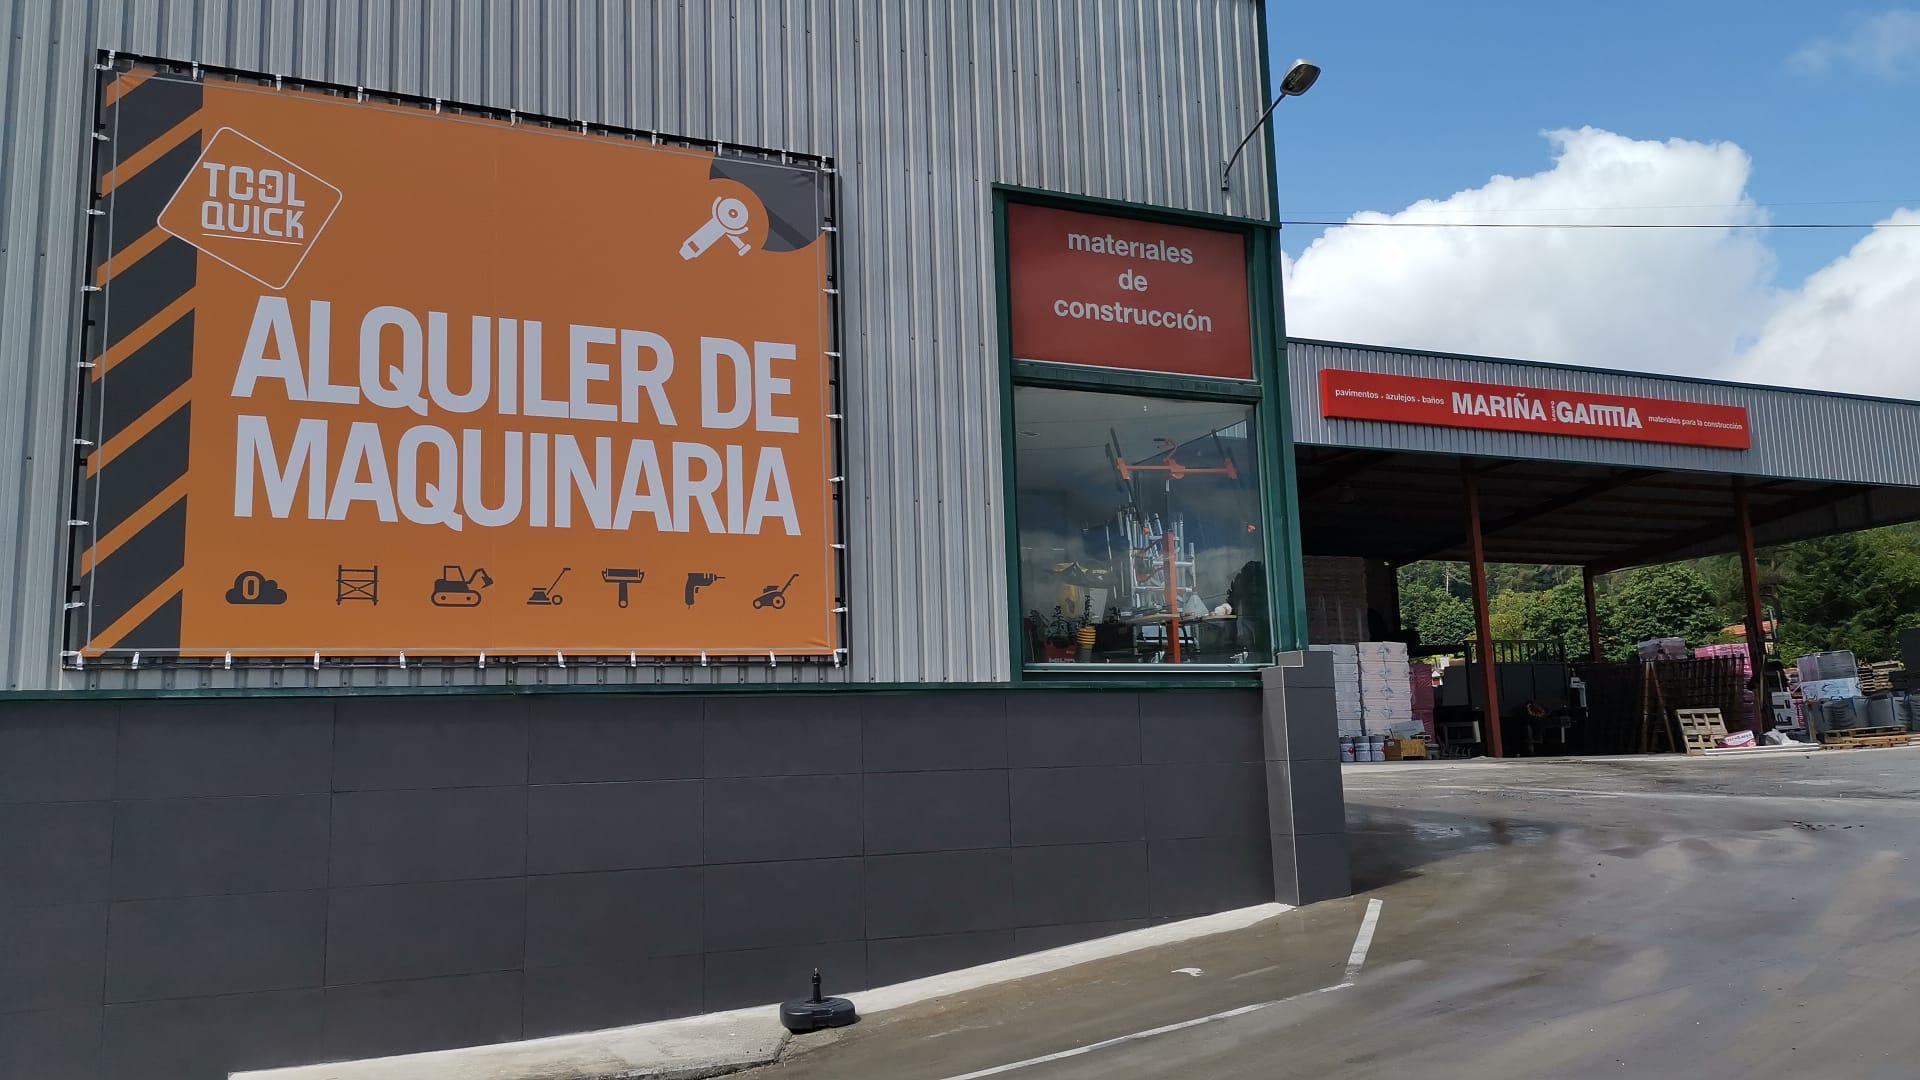 ToolQuick Mariña (Gamma Mariña)